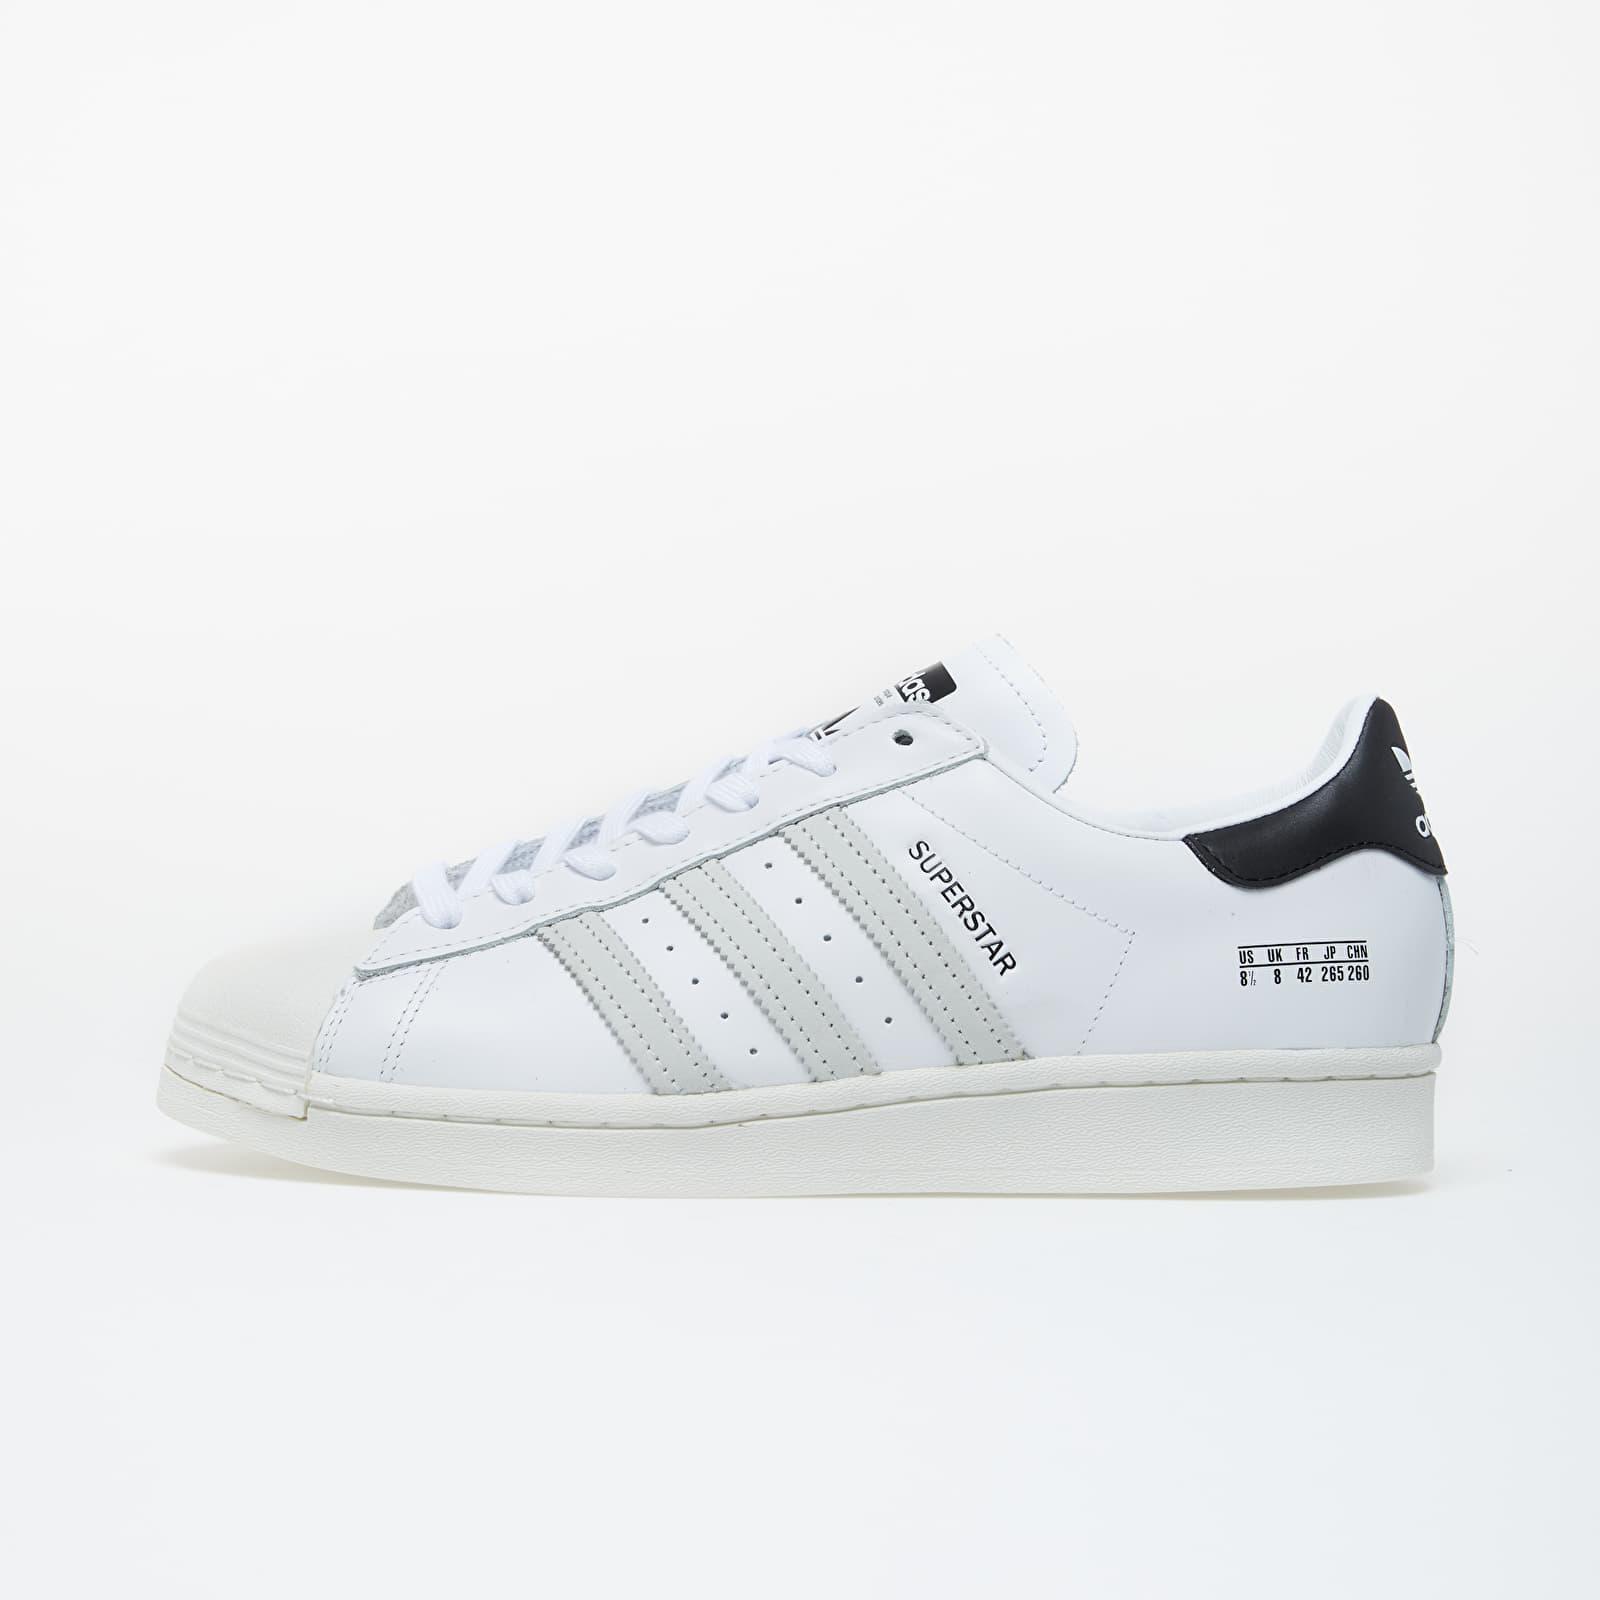 Zapatillas Hombre adidas Superstar Ftw White/ Ftw White/ Core Black